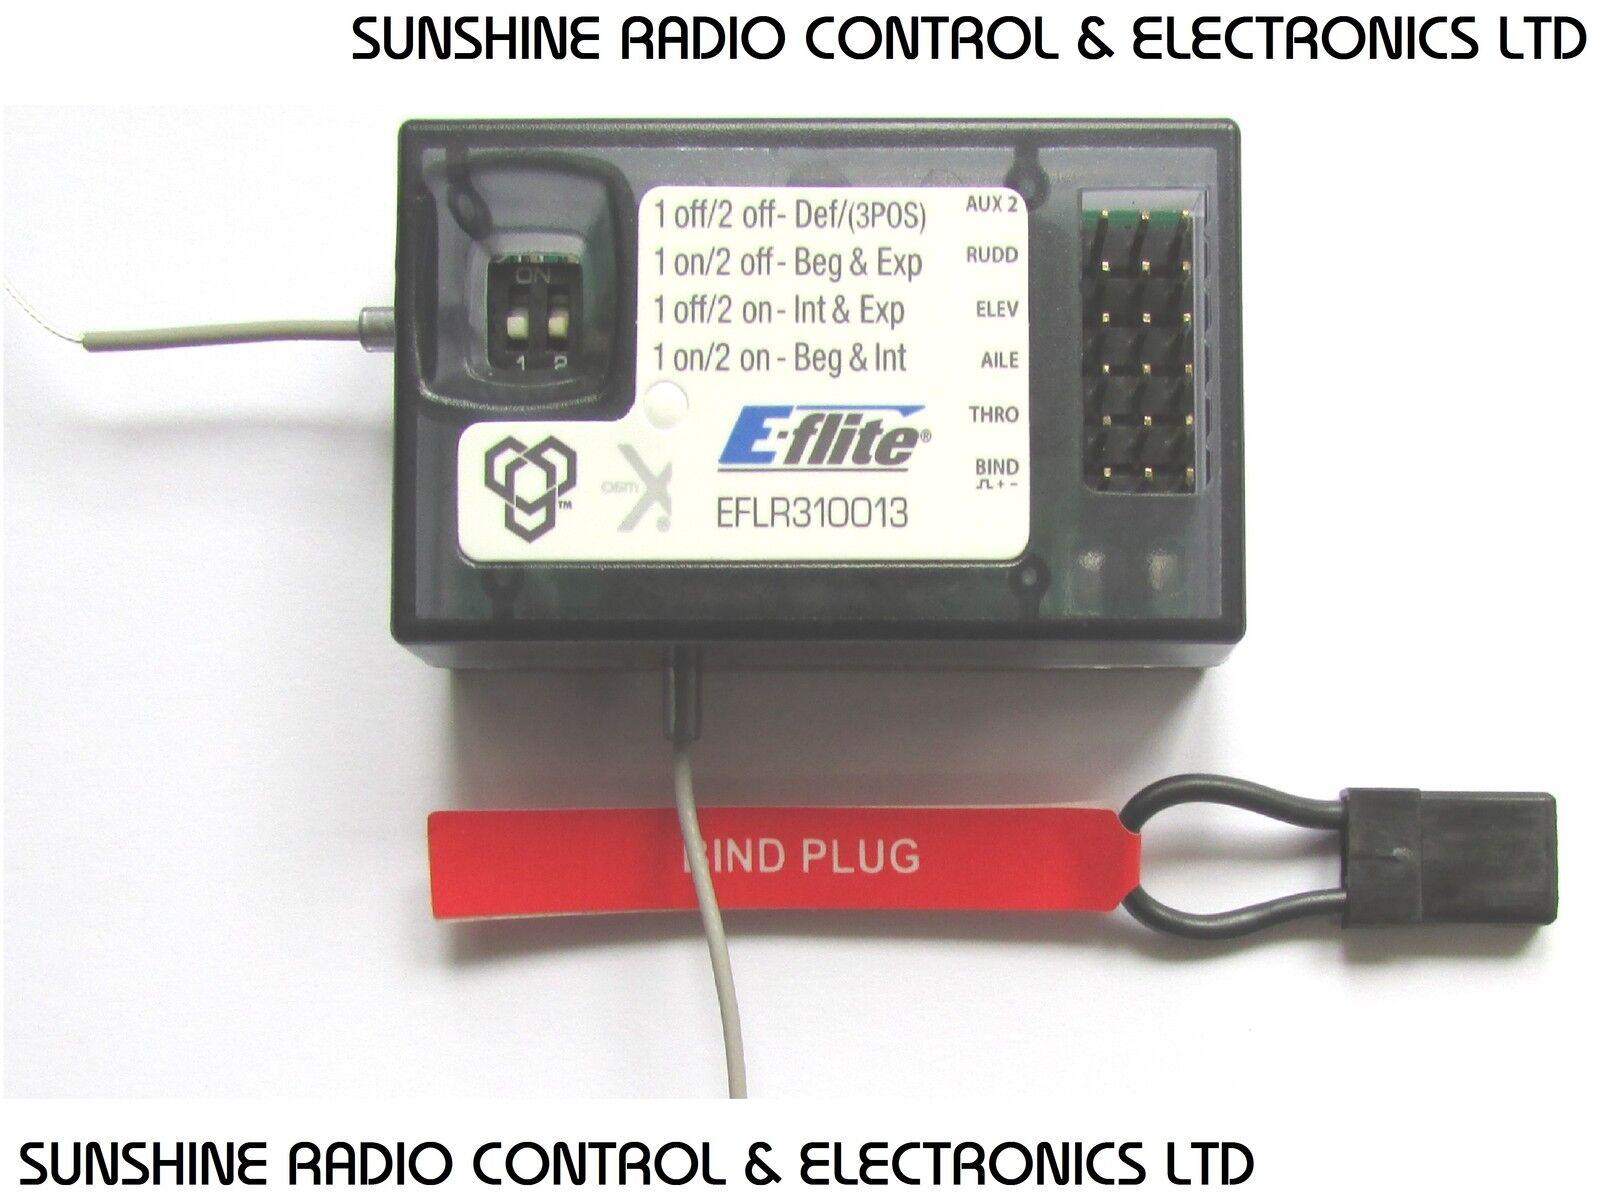 Receiver E-Flite SAFE RX Technology EFLR310013 2.4ghz DSMX 5 Channel NEW UK